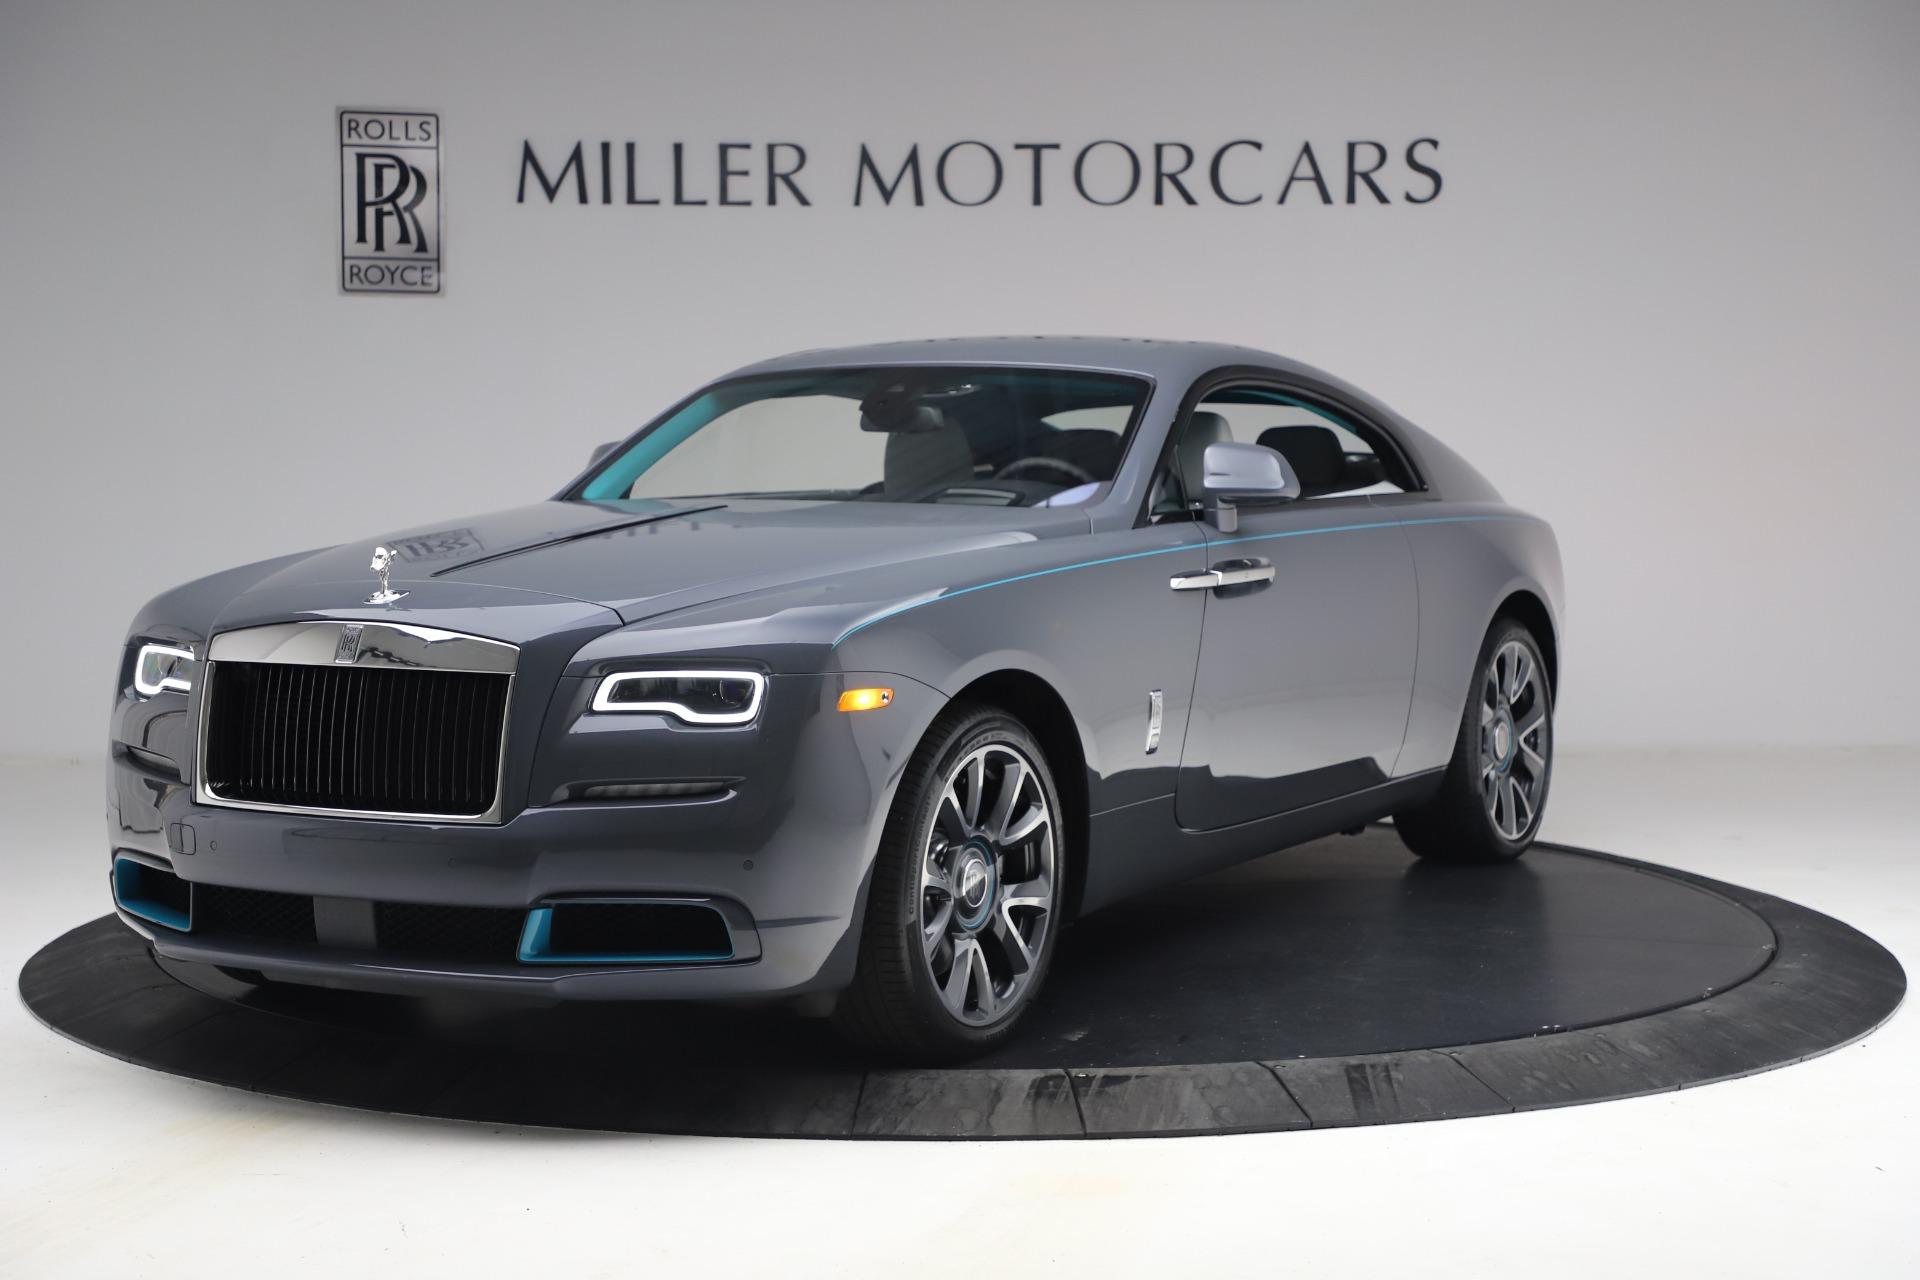 Used 2021 Rolls-Royce Wraith KRYPTOS for sale $444,275 at Maserati of Westport in Westport CT 06880 1